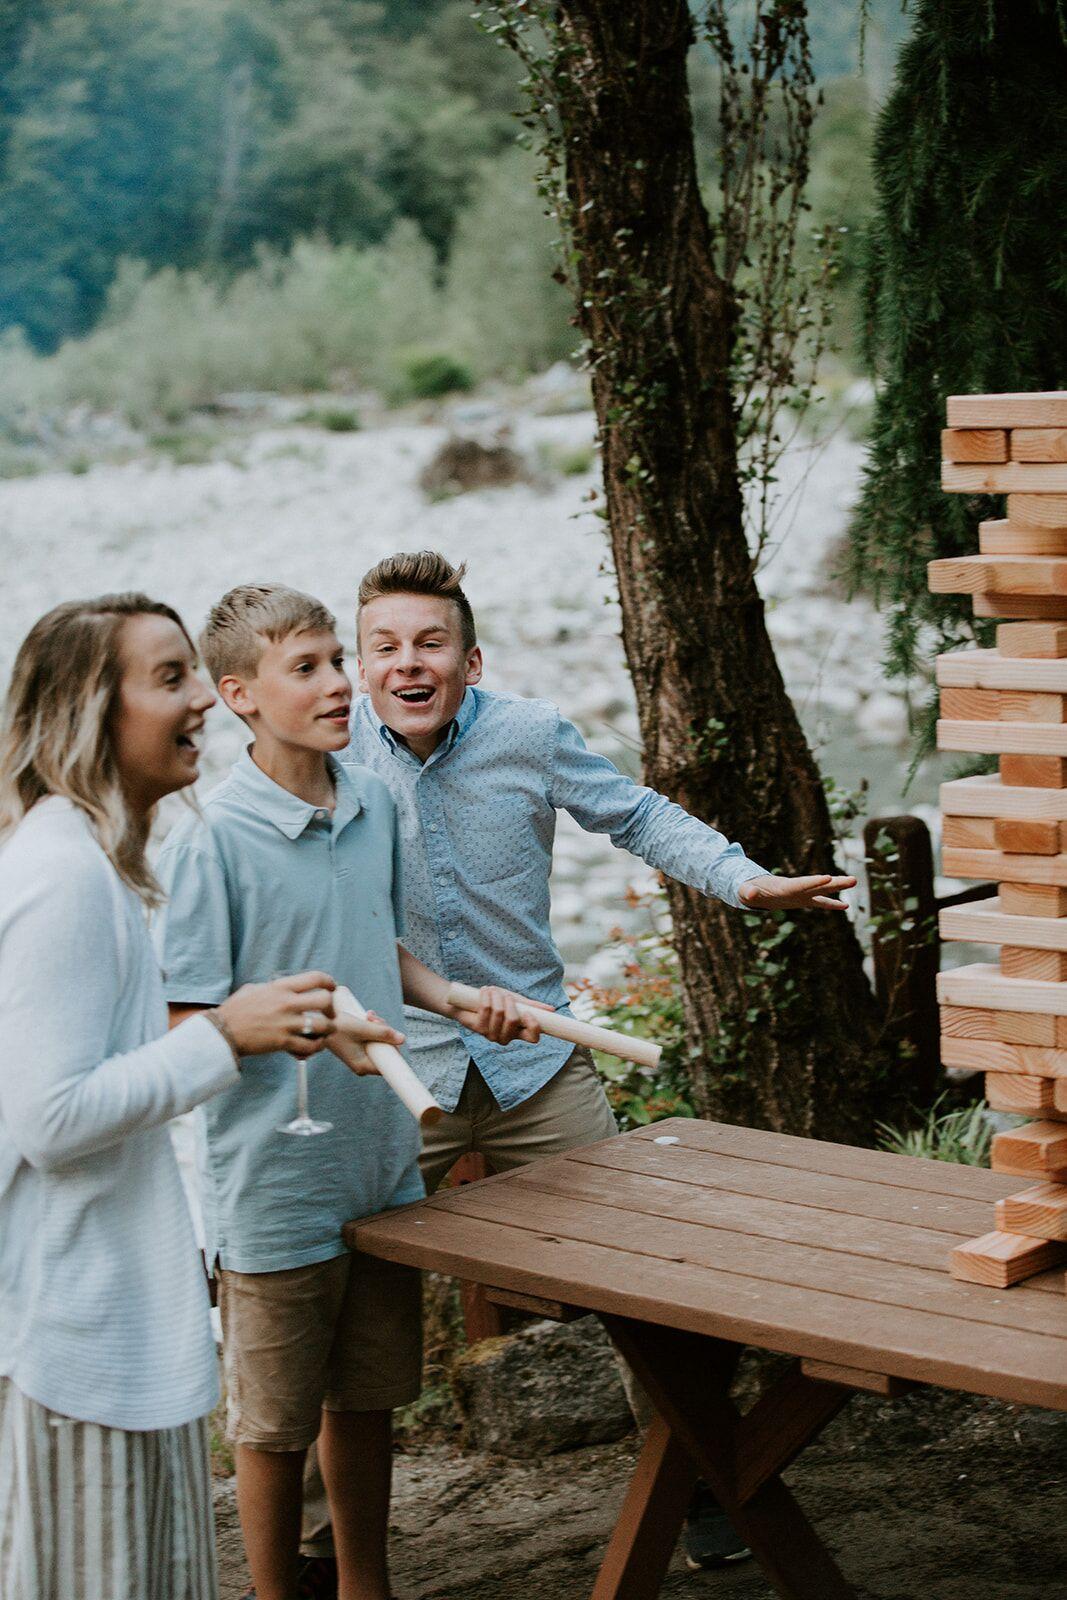 Blue-Sky-Ranch-Wedding-Block-Weddings-and-Events30.jpeg